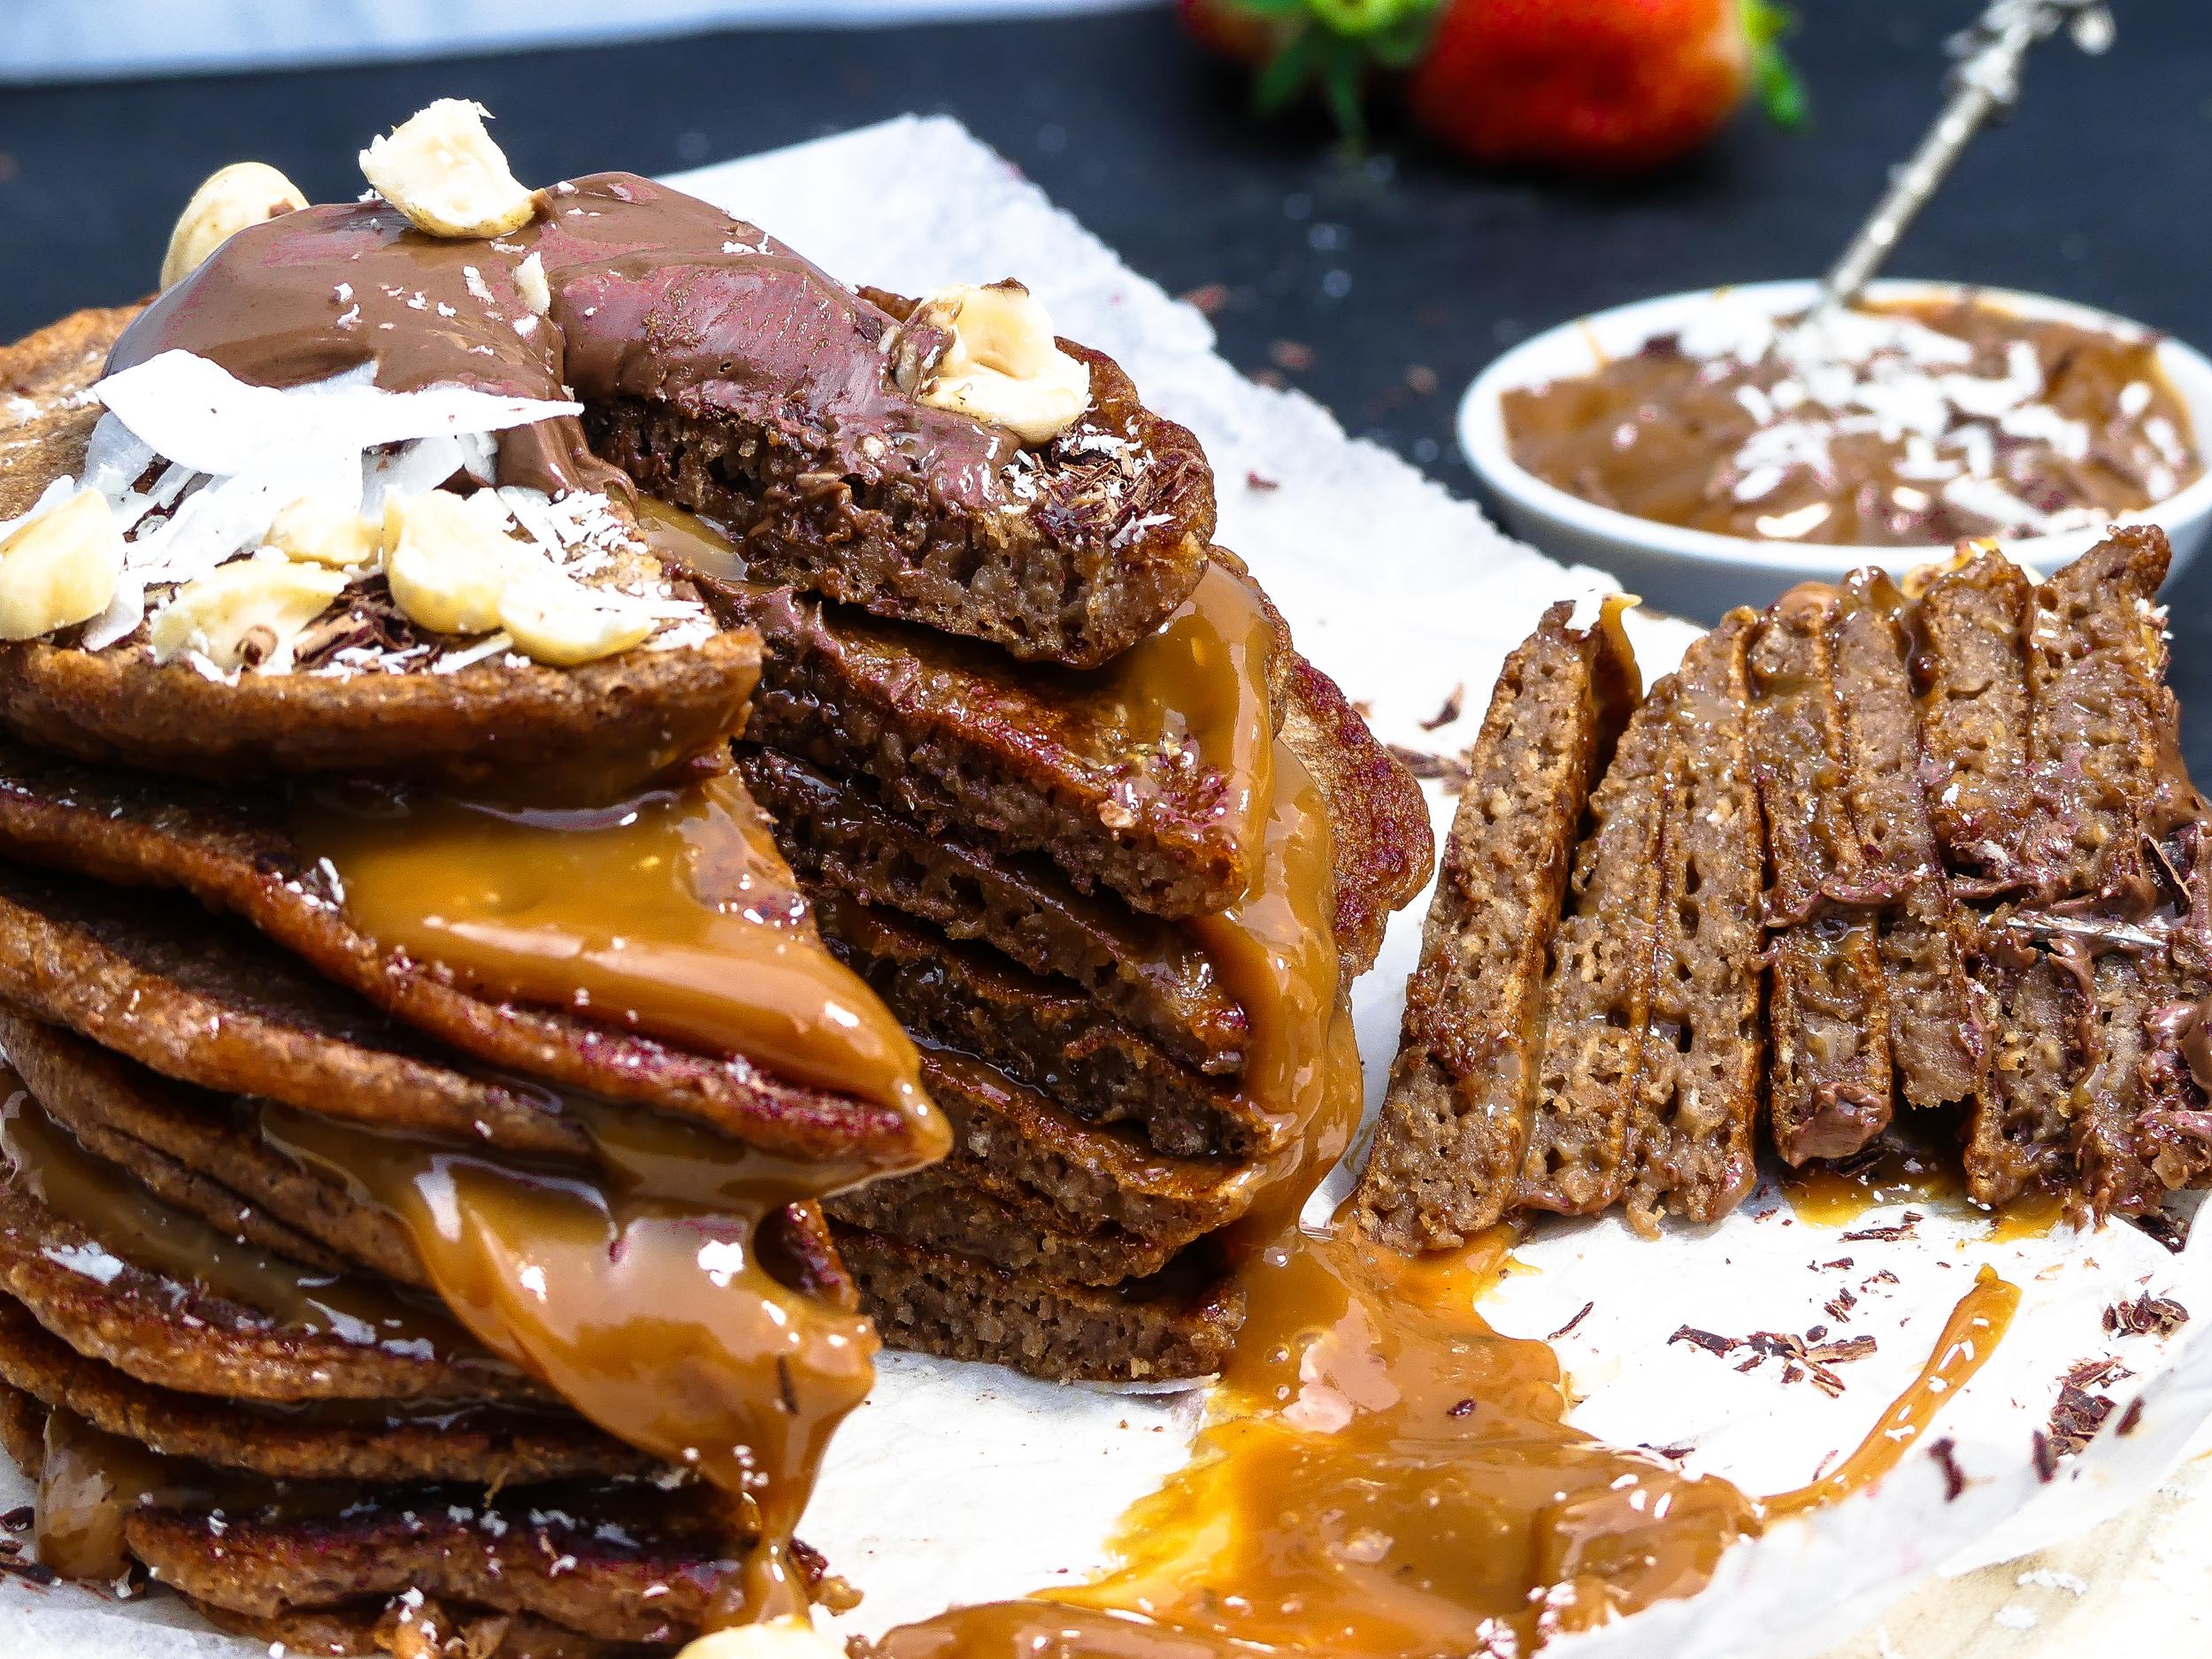 Goddelijke choco-karamel koffie pannenkoeken